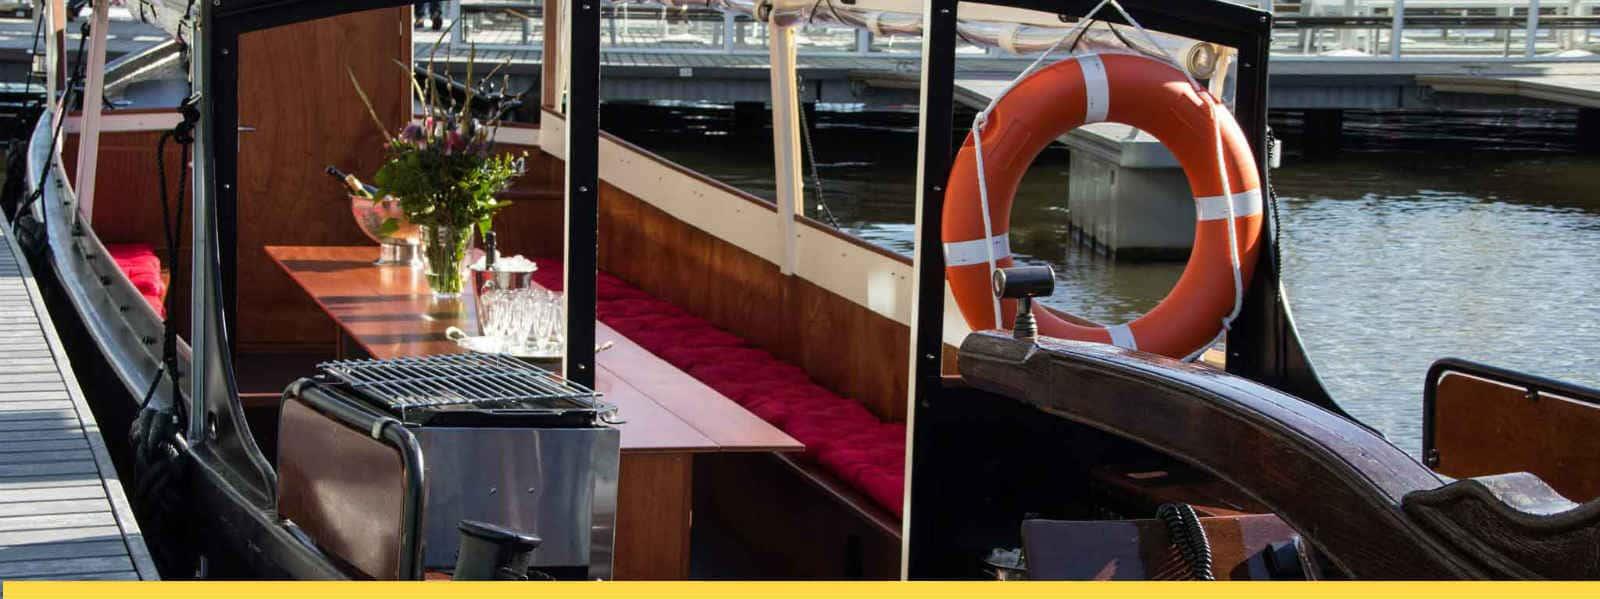 Stella Maris BBQ op het water